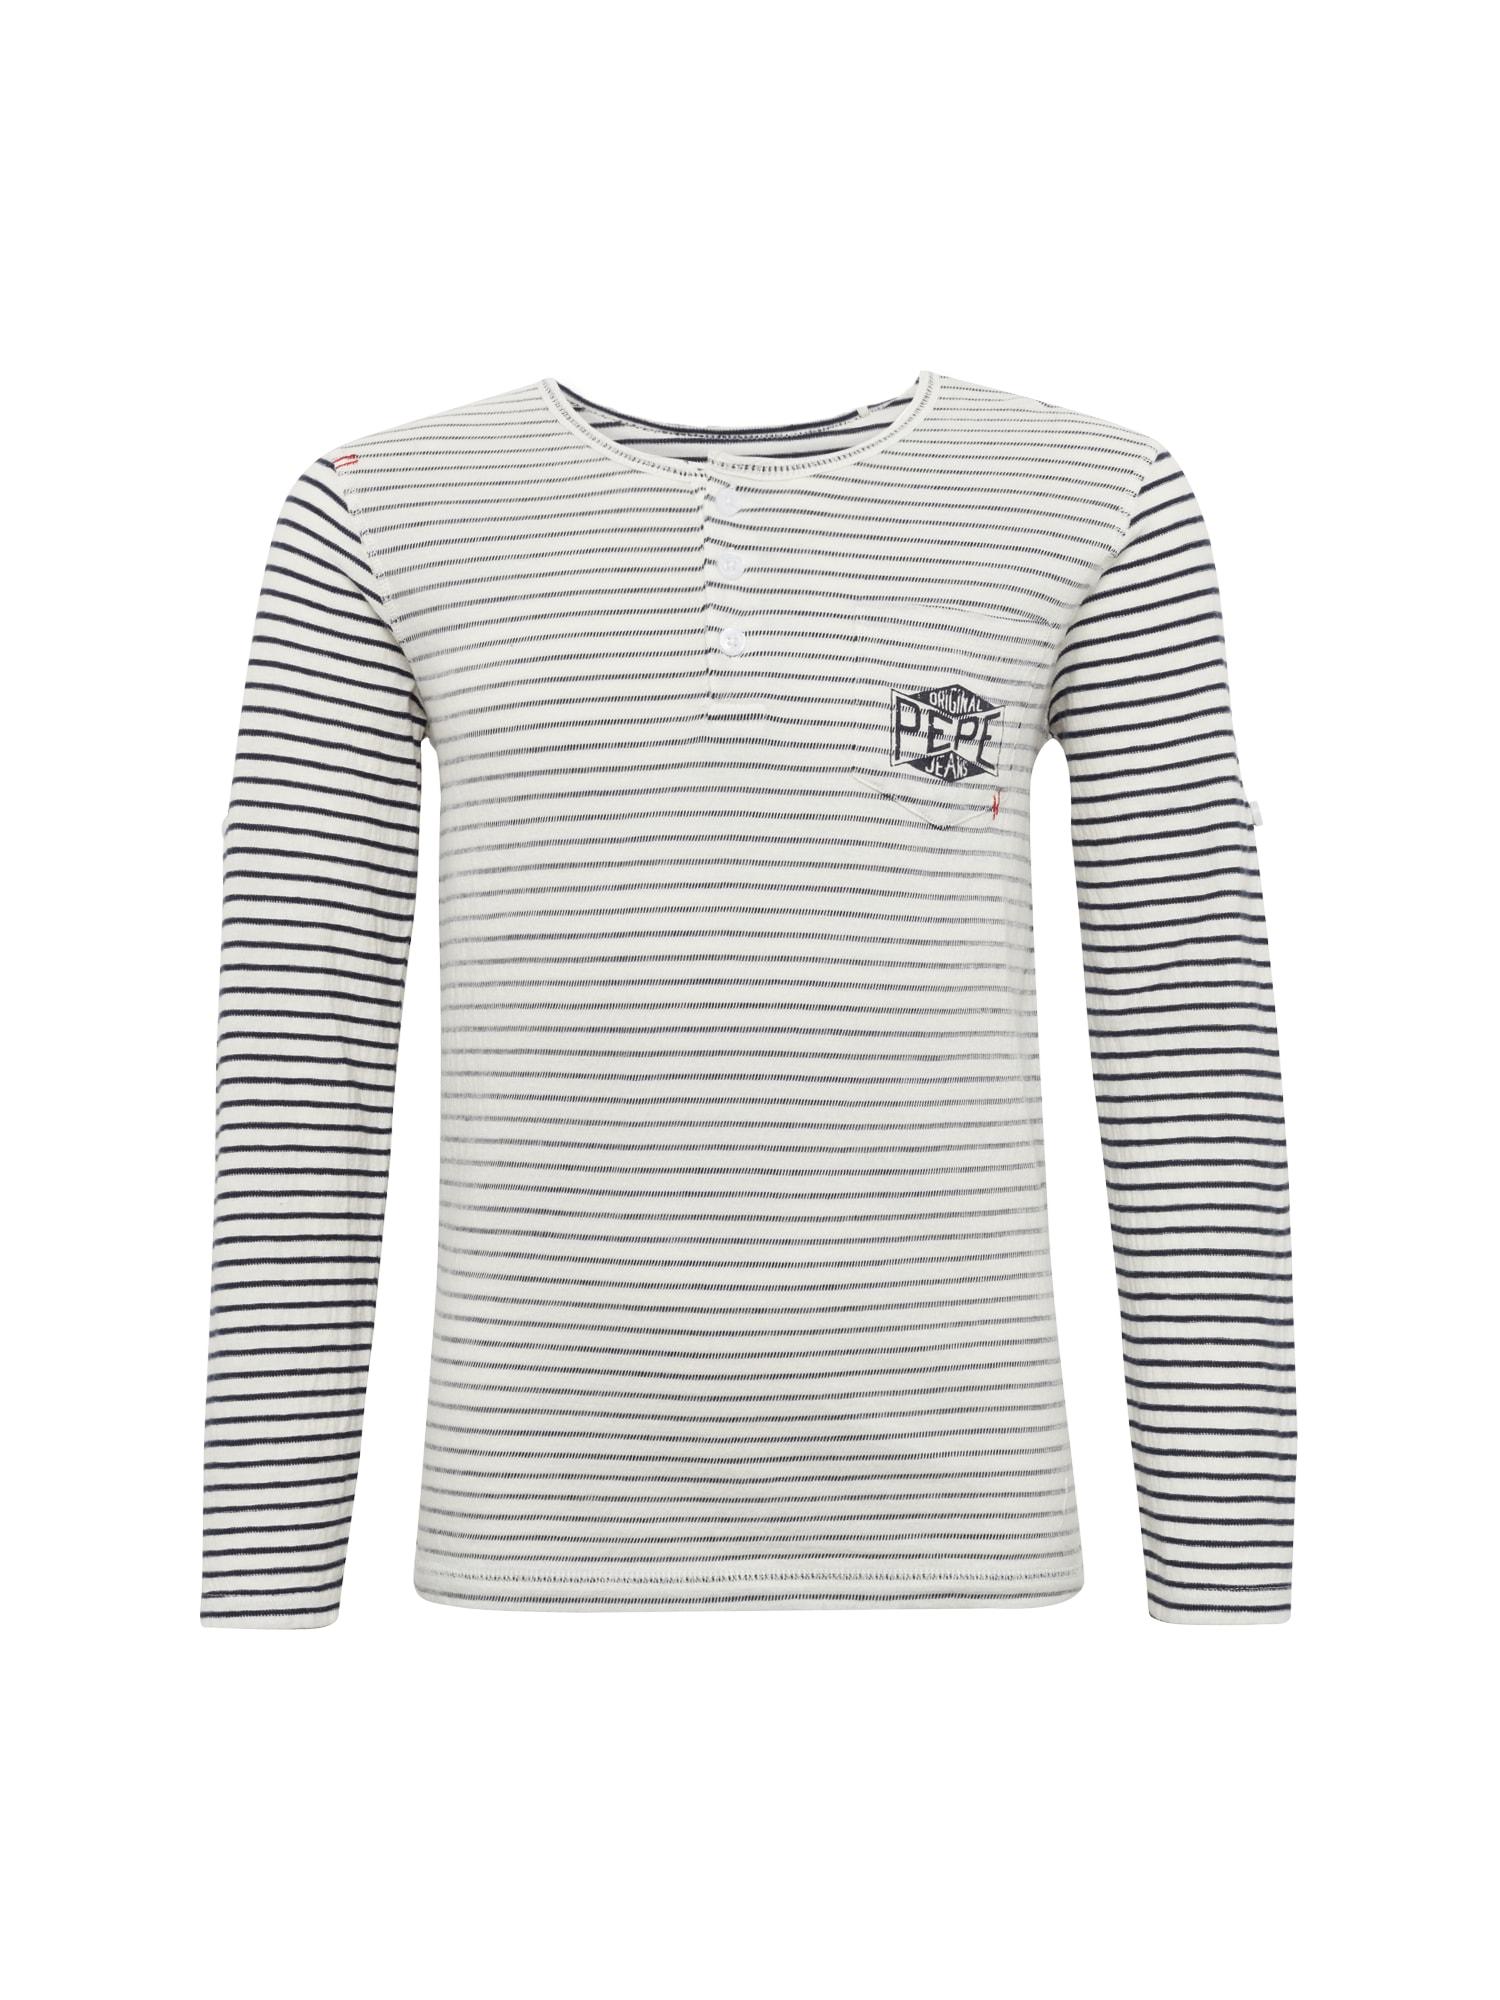 Pepe Jeans Jongens Shirt JOBBY grijs zwart wit